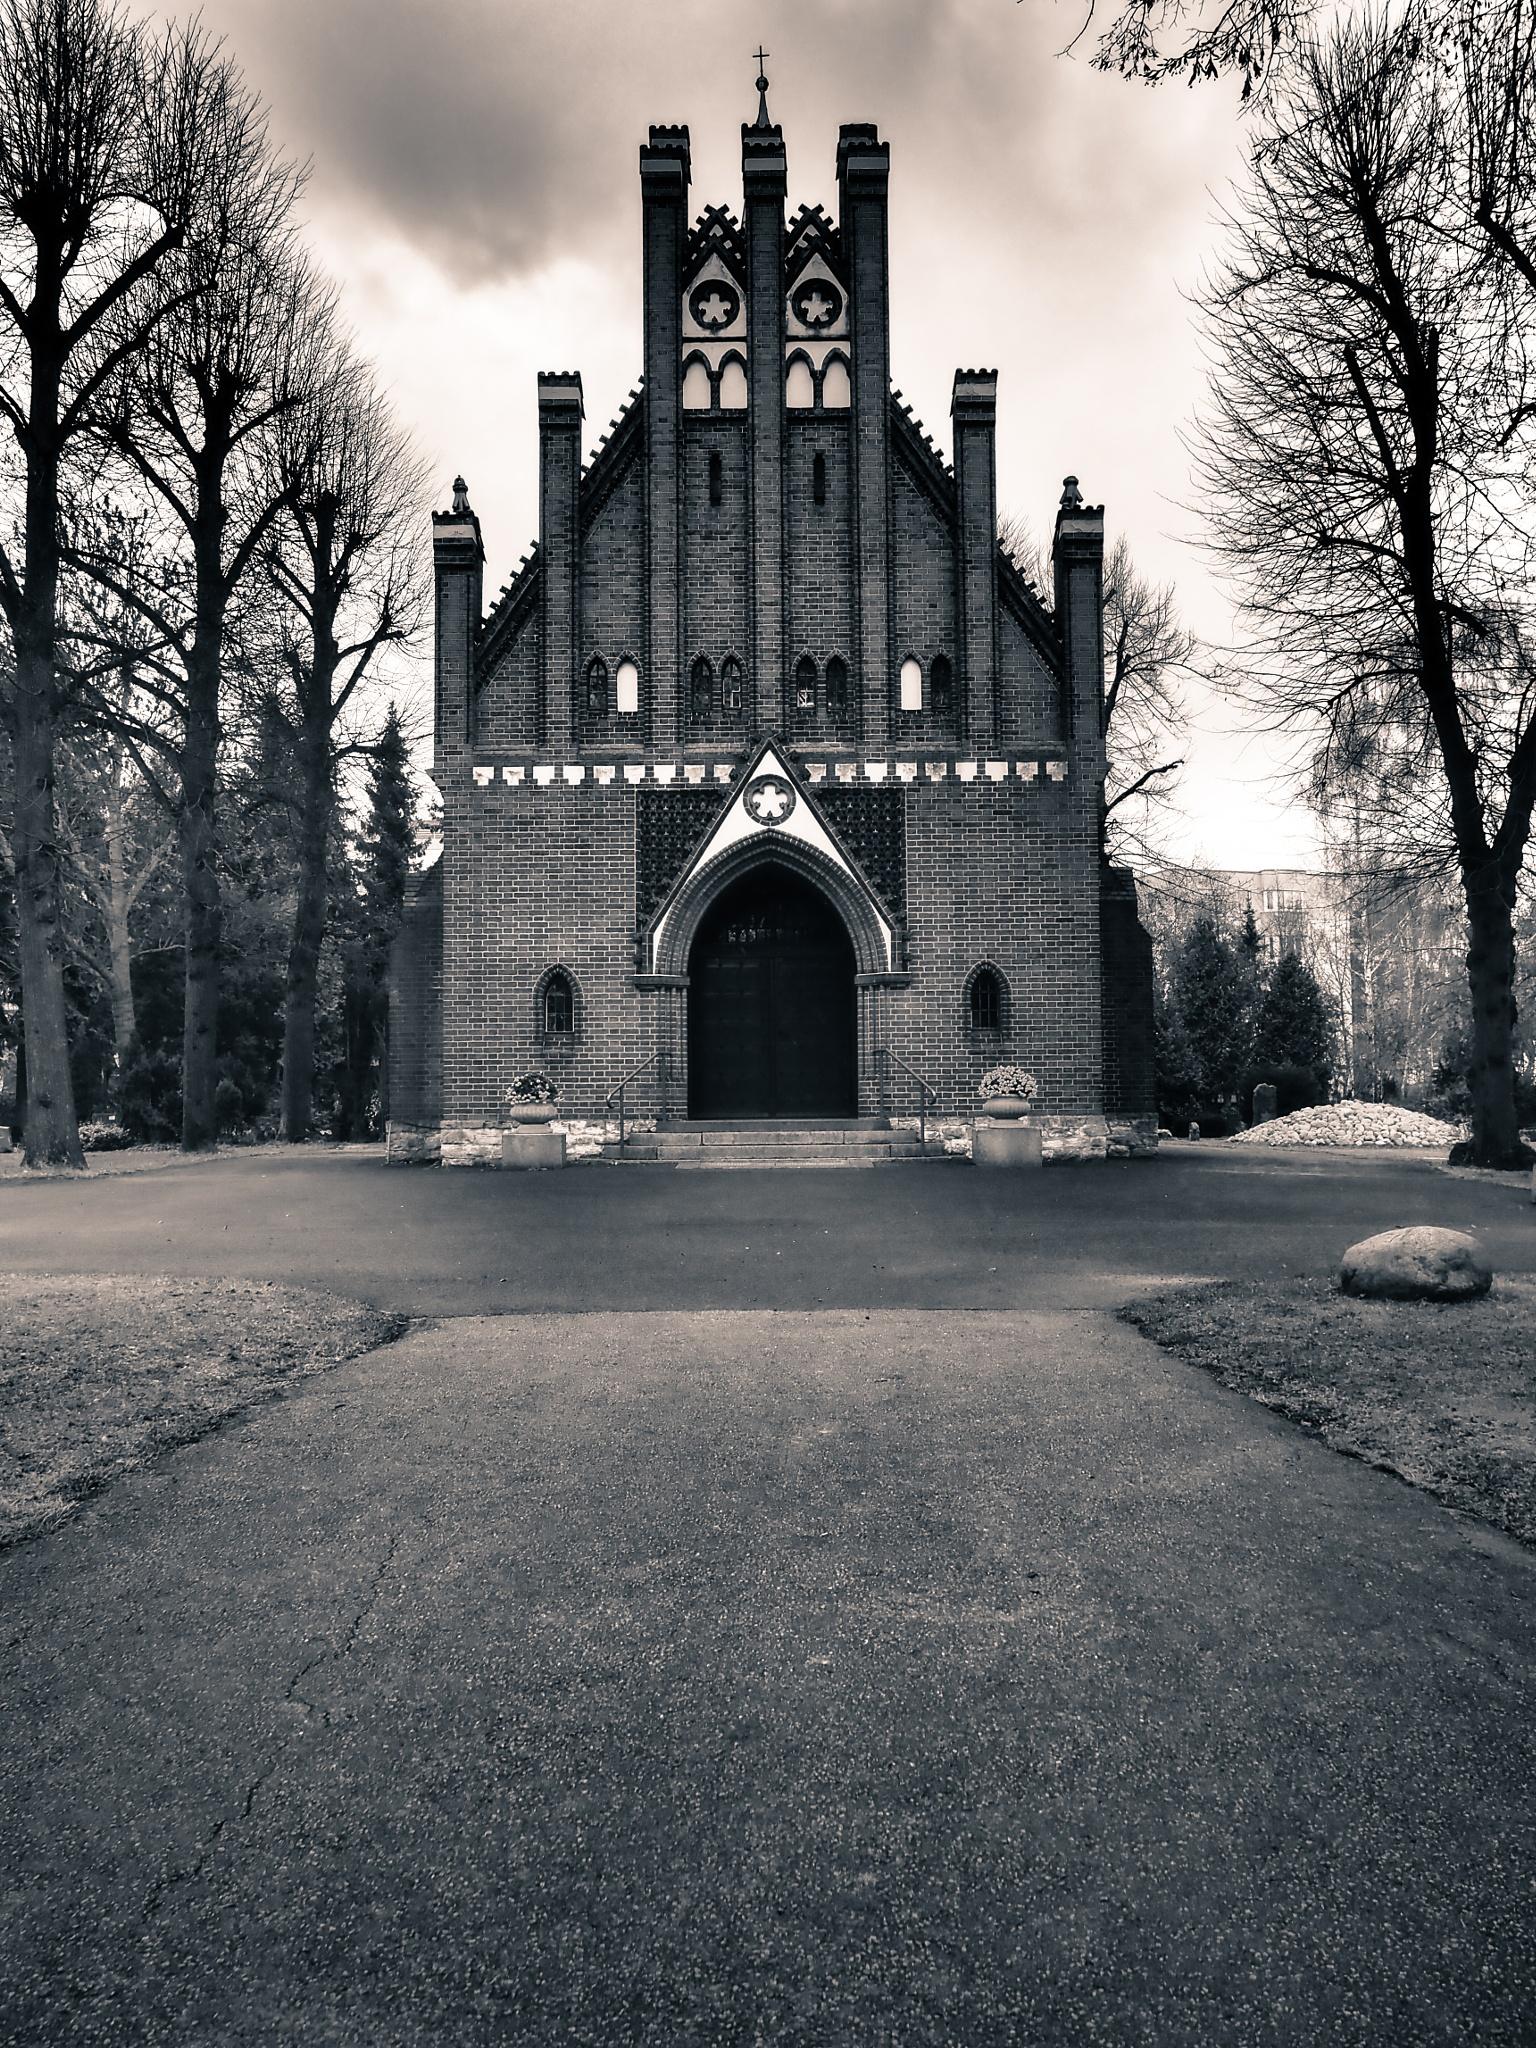 Berlin Little Church Black & White by Jeans Brown Photography / Jens Schwarz